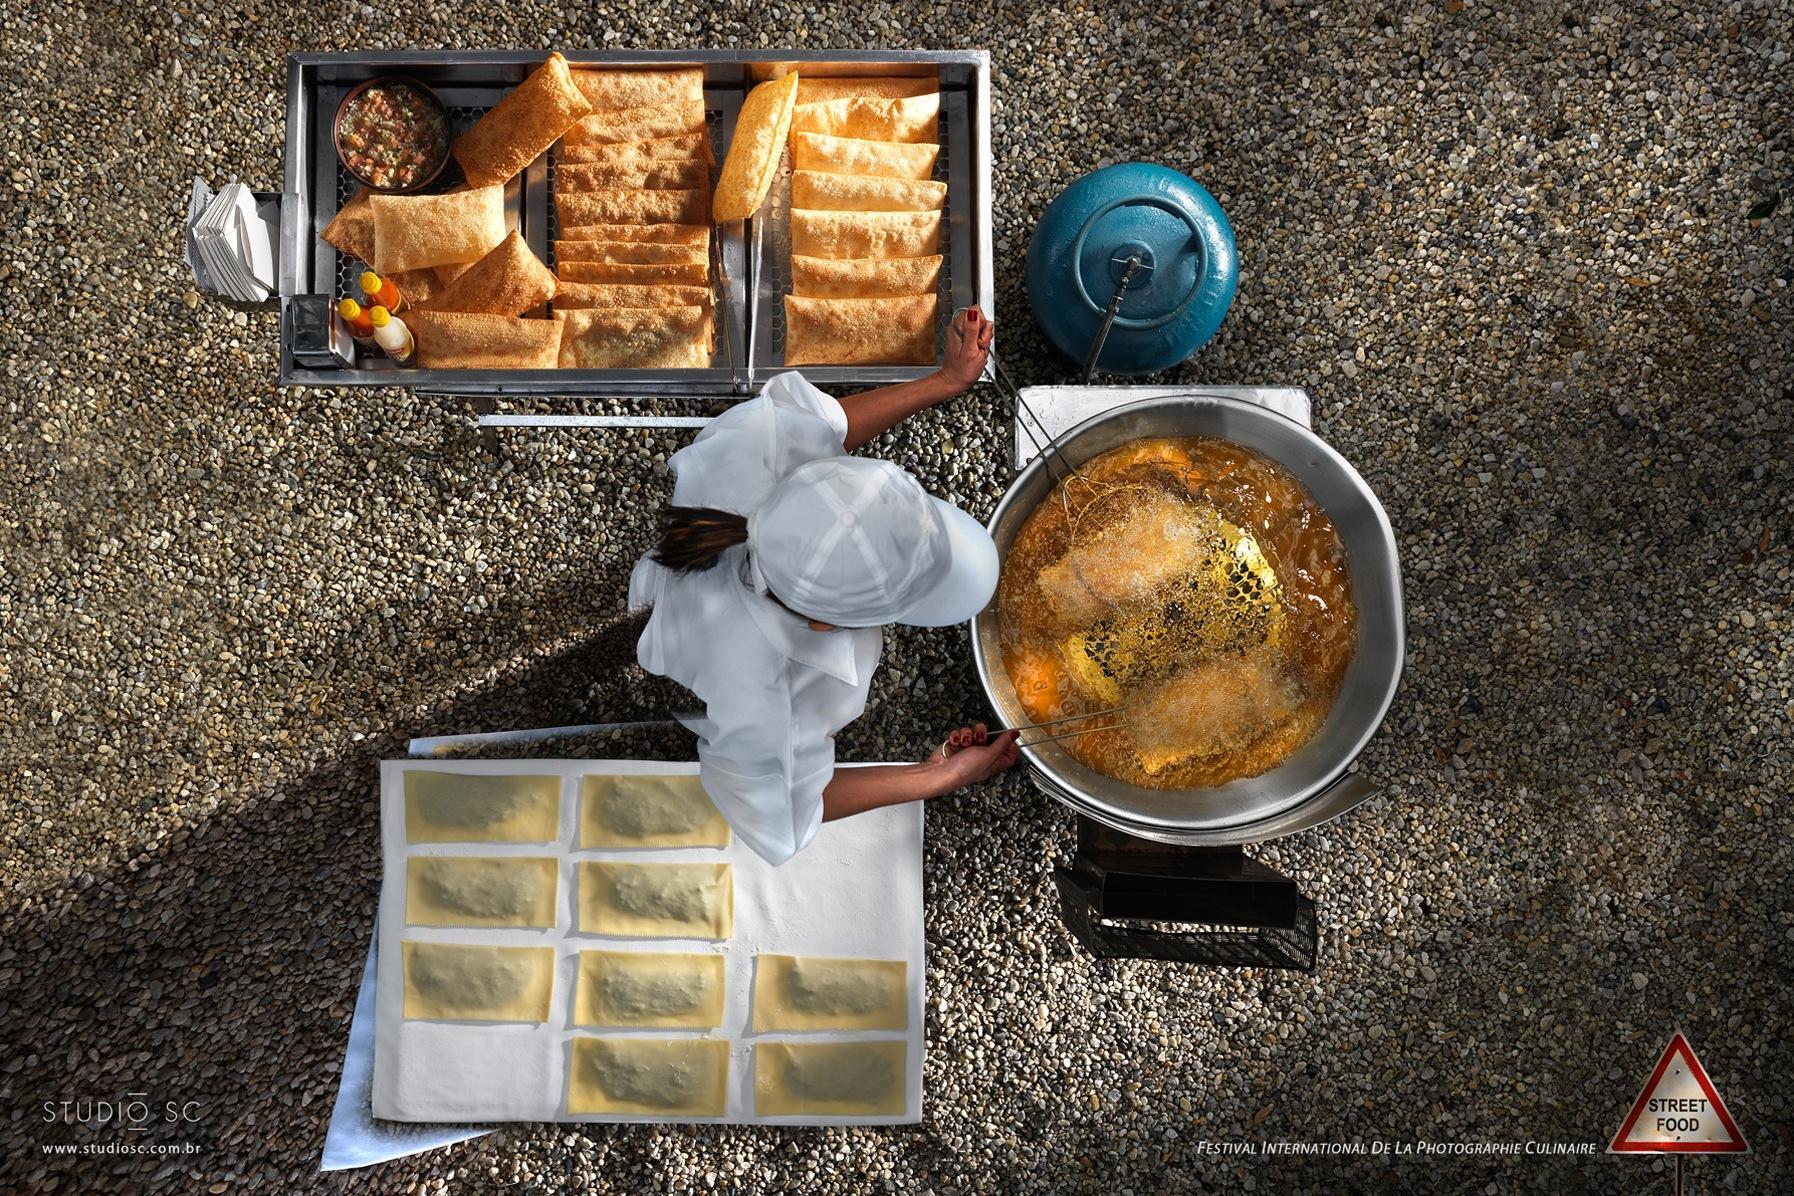 Festival International de la Photographie Culinaire Print Ad -  Street Food, 3